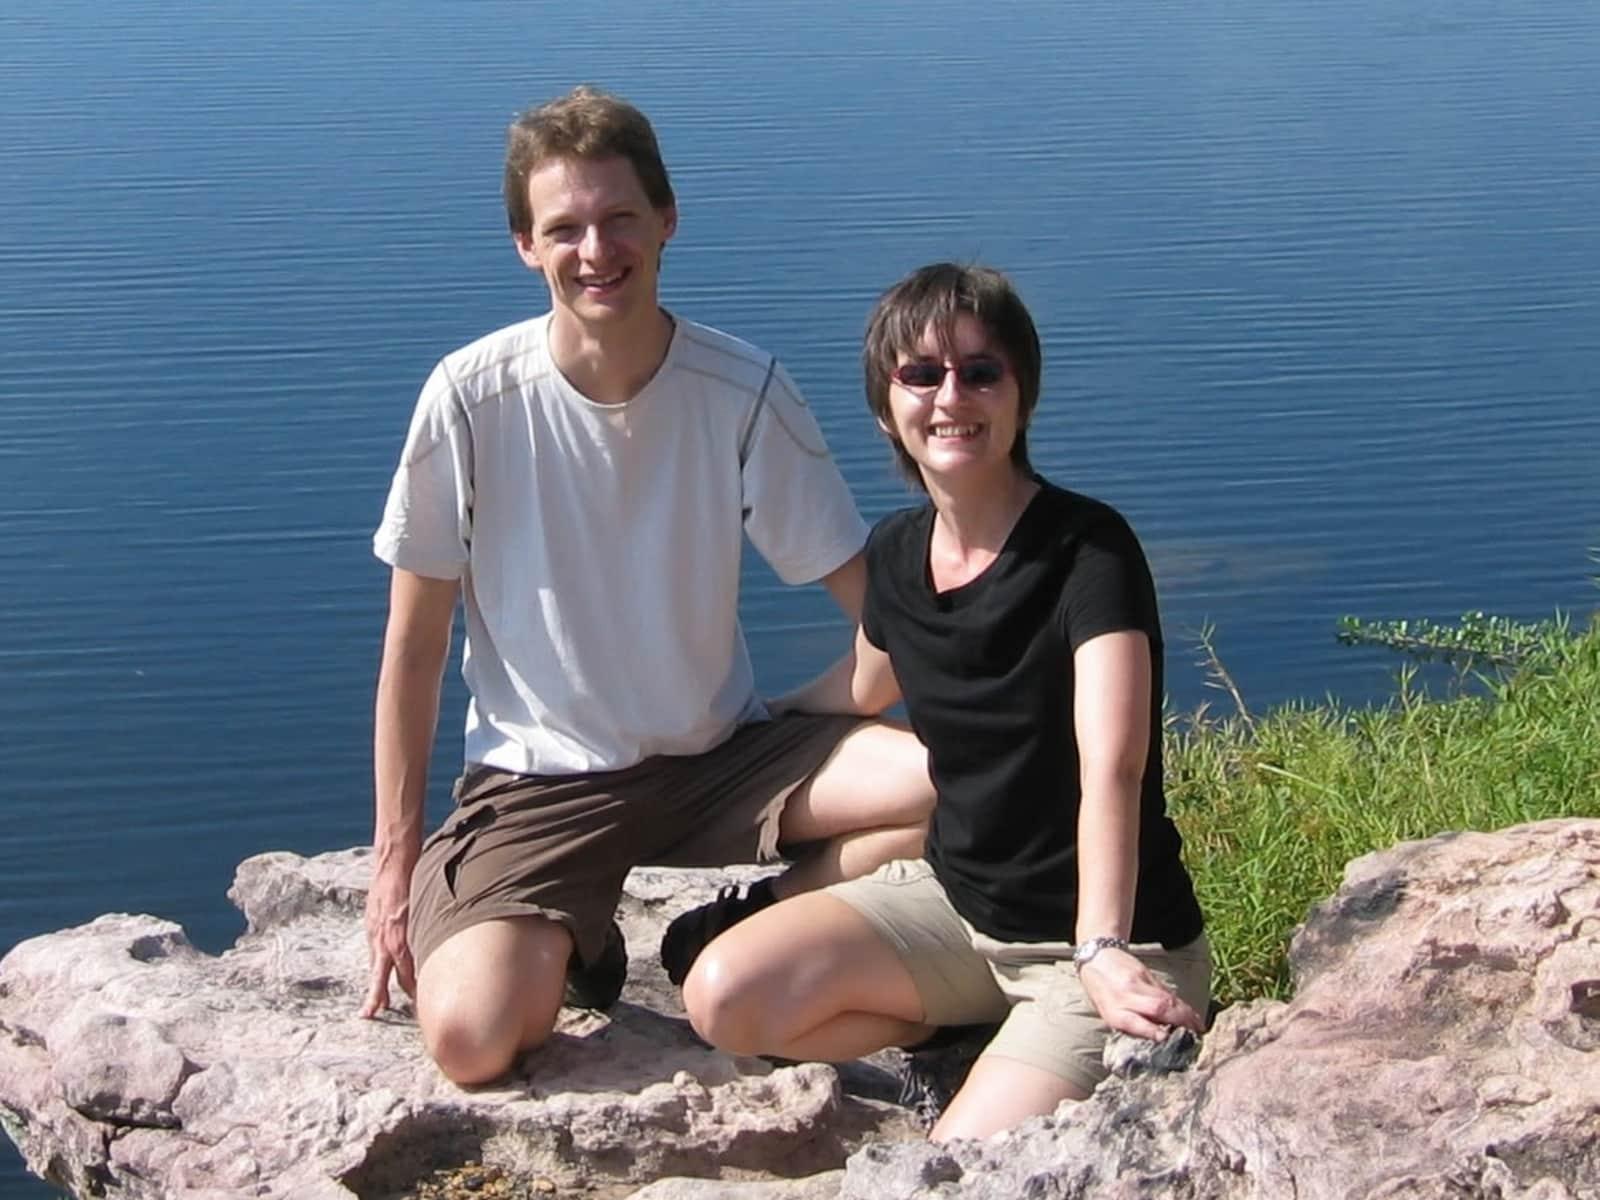 Jean-francois & France from Halifax, Nova Scotia, Canada